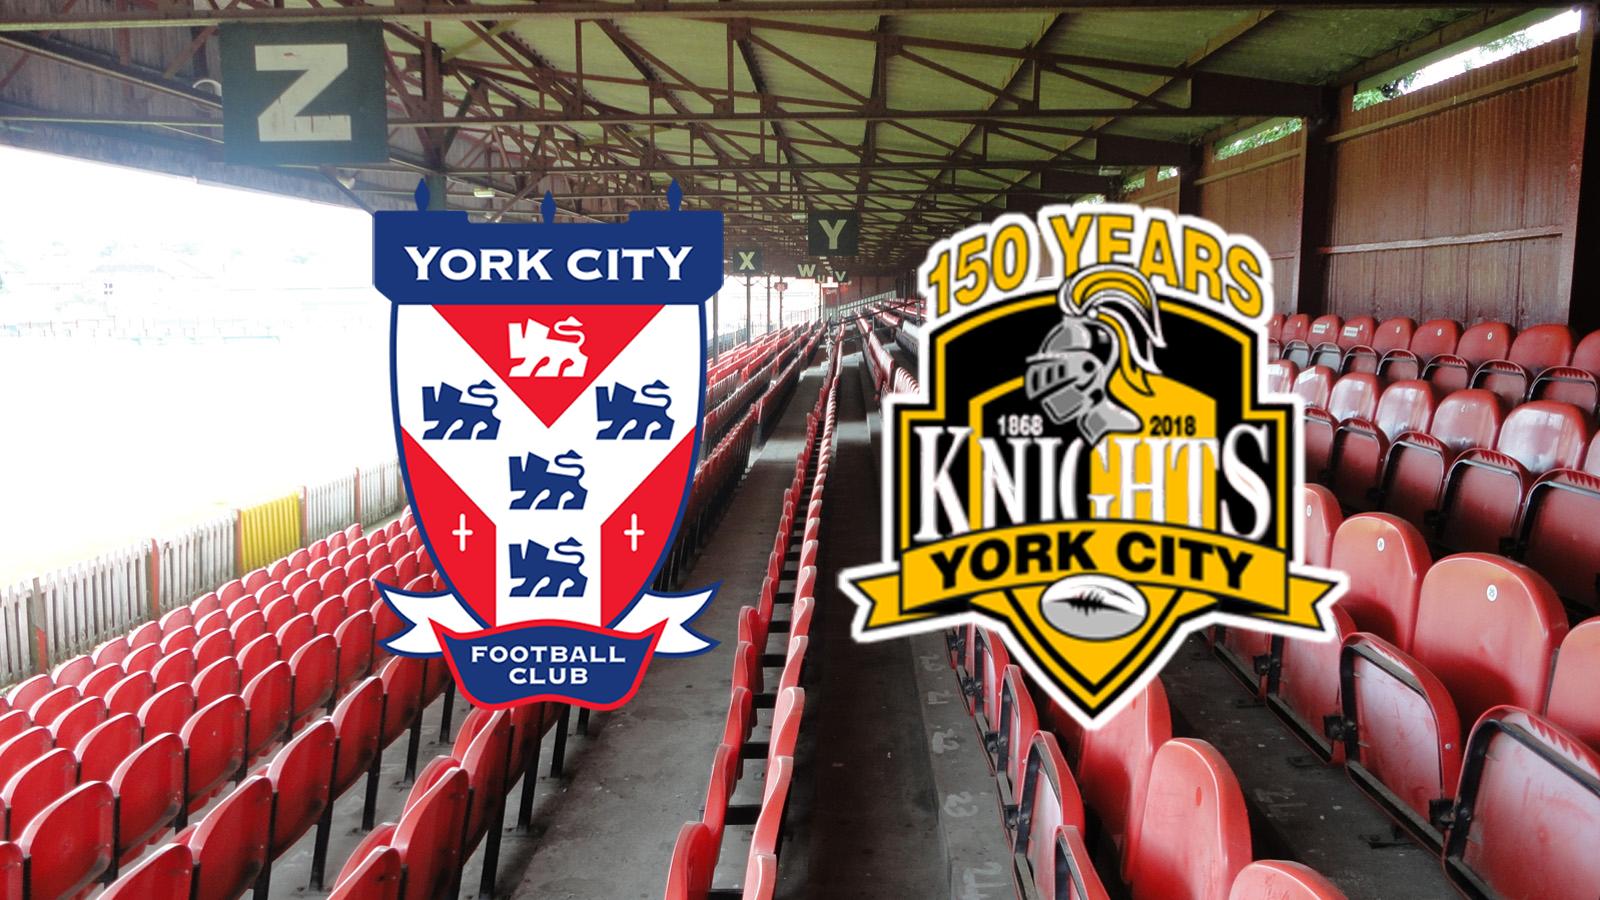 City Knights Ticket Promo